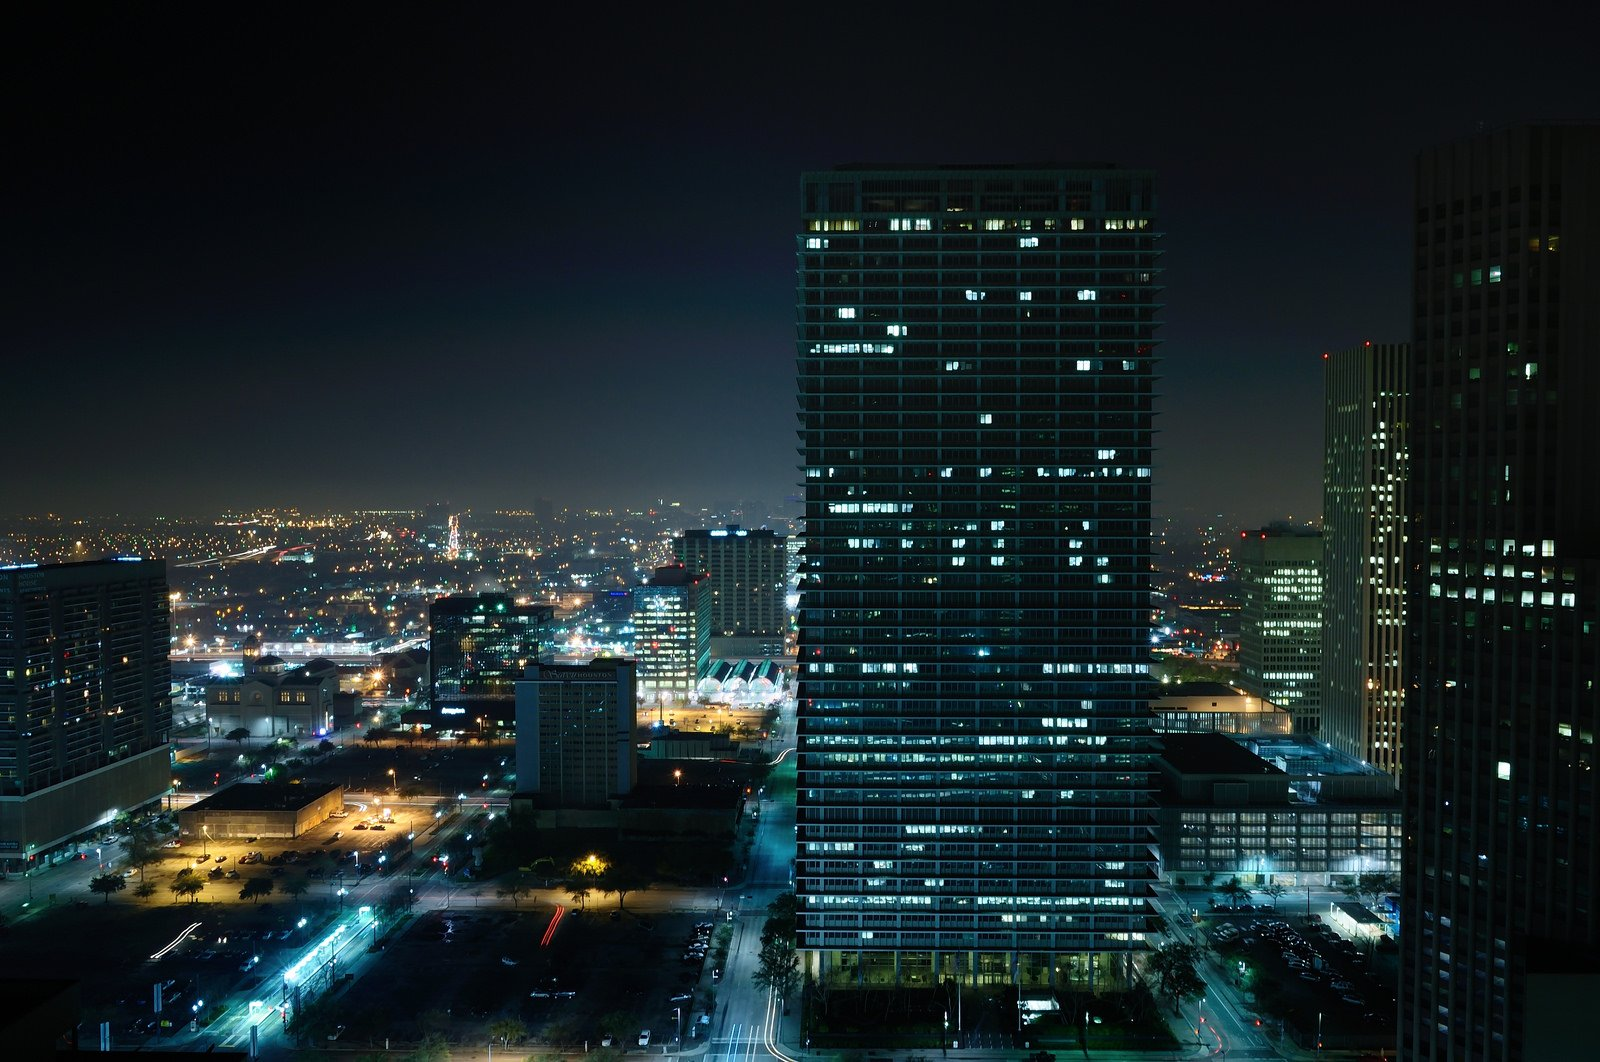 Houston architecture bridges cities City texas Night towers buildings 1600x1062